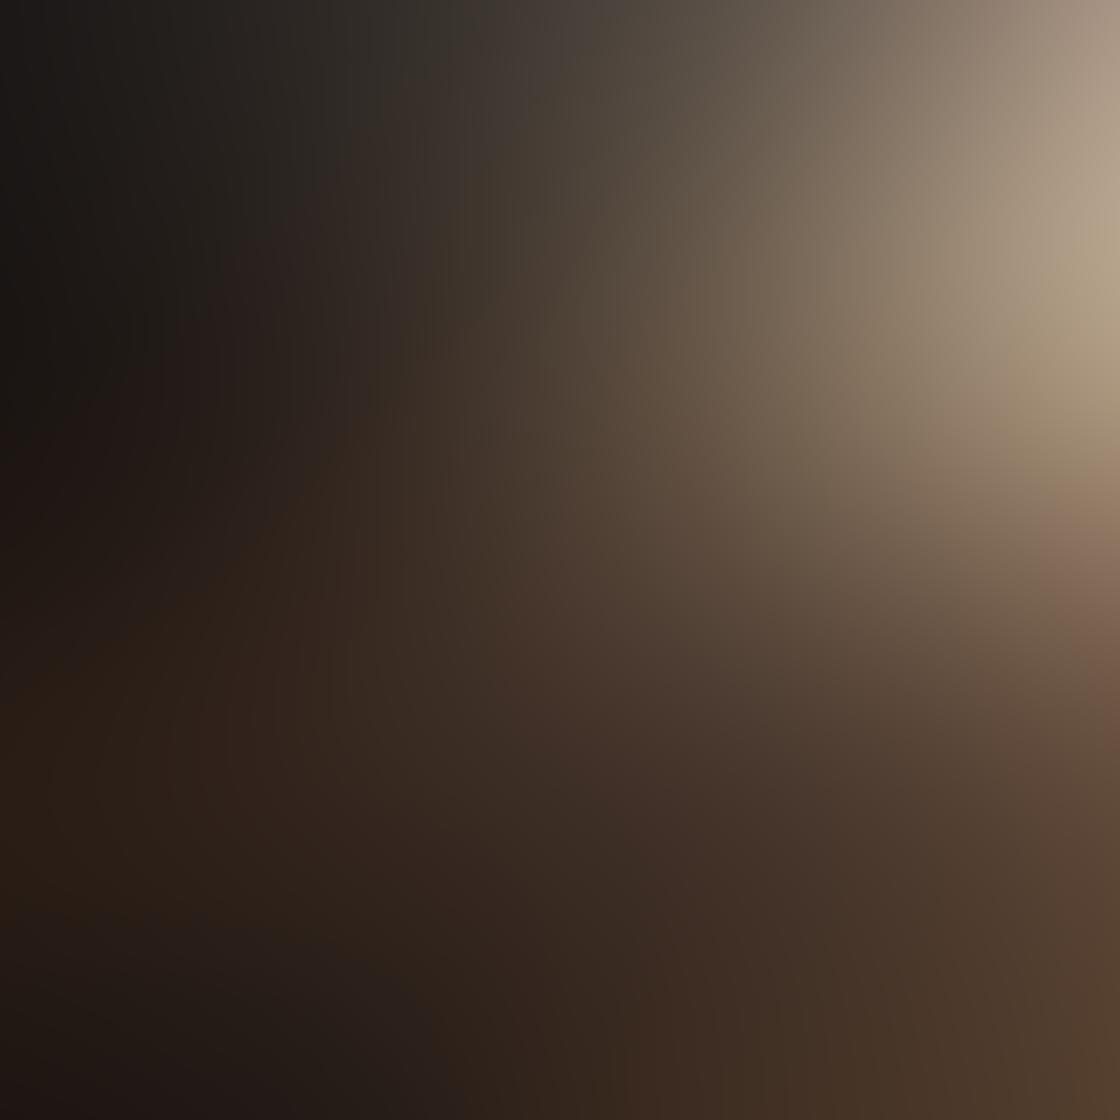 iPhone Photos Lens Flare 16